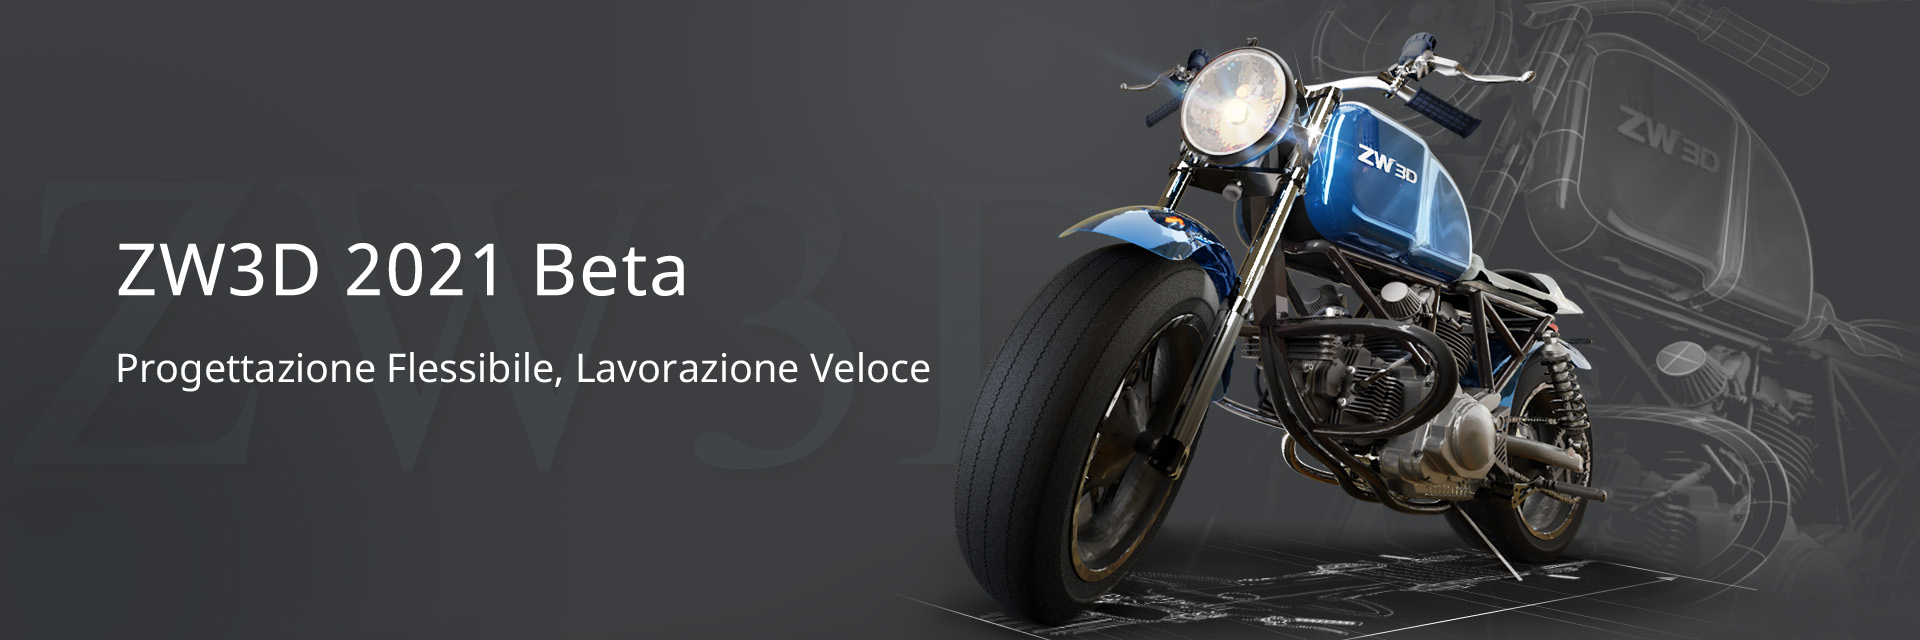 it-Banner_ZW3D_2021_beta.jpg